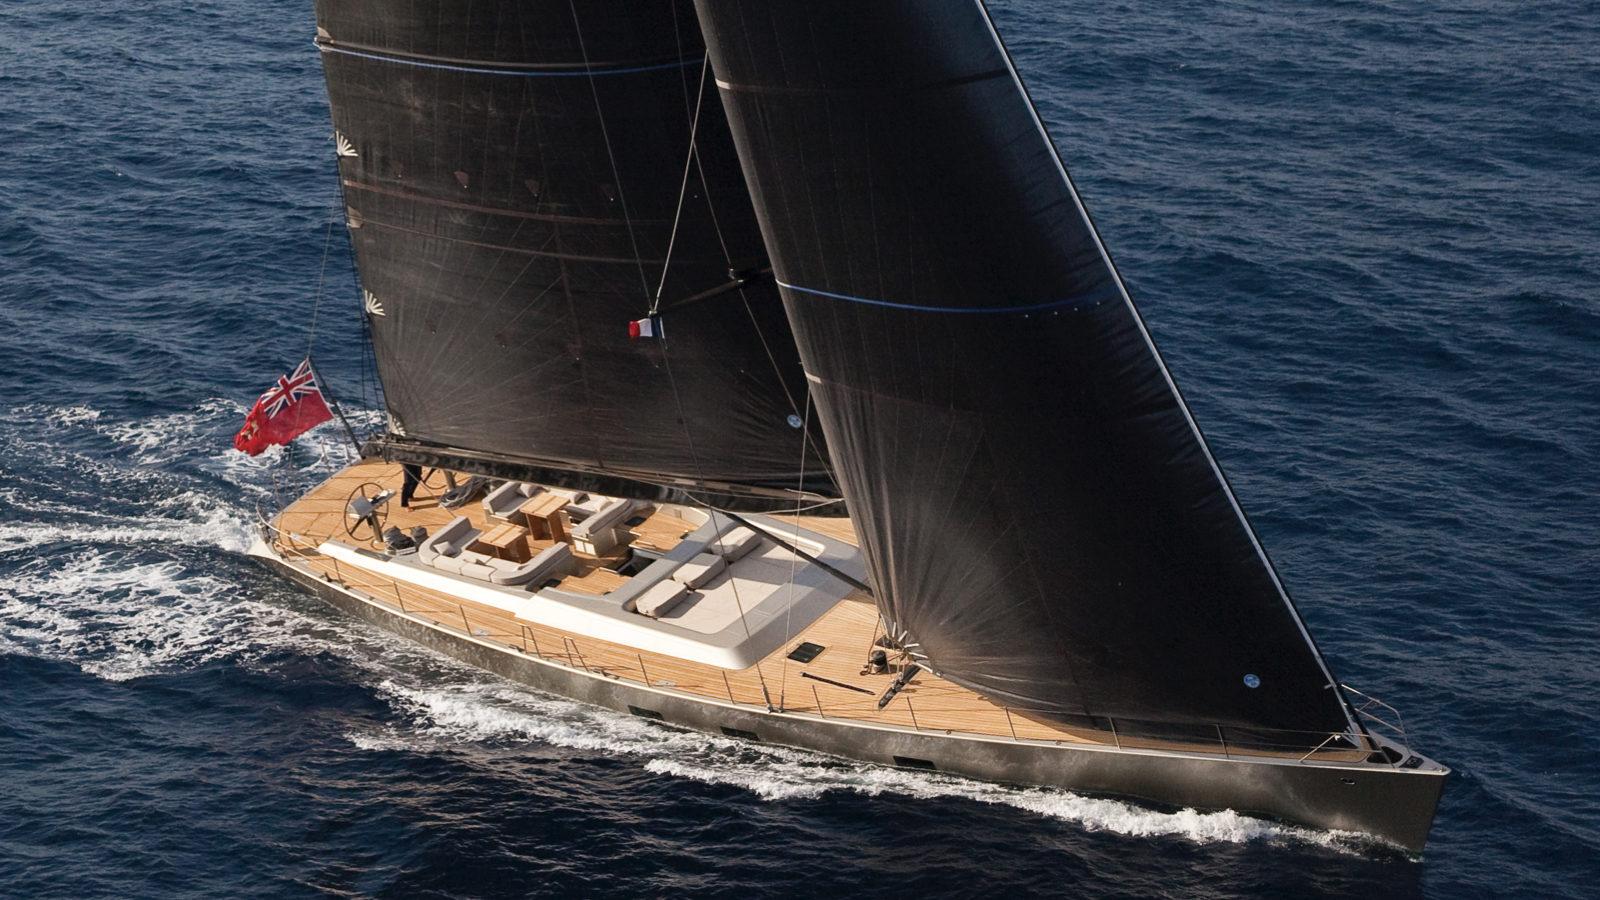 DARK SHADOW Yacht for Sale - IYC